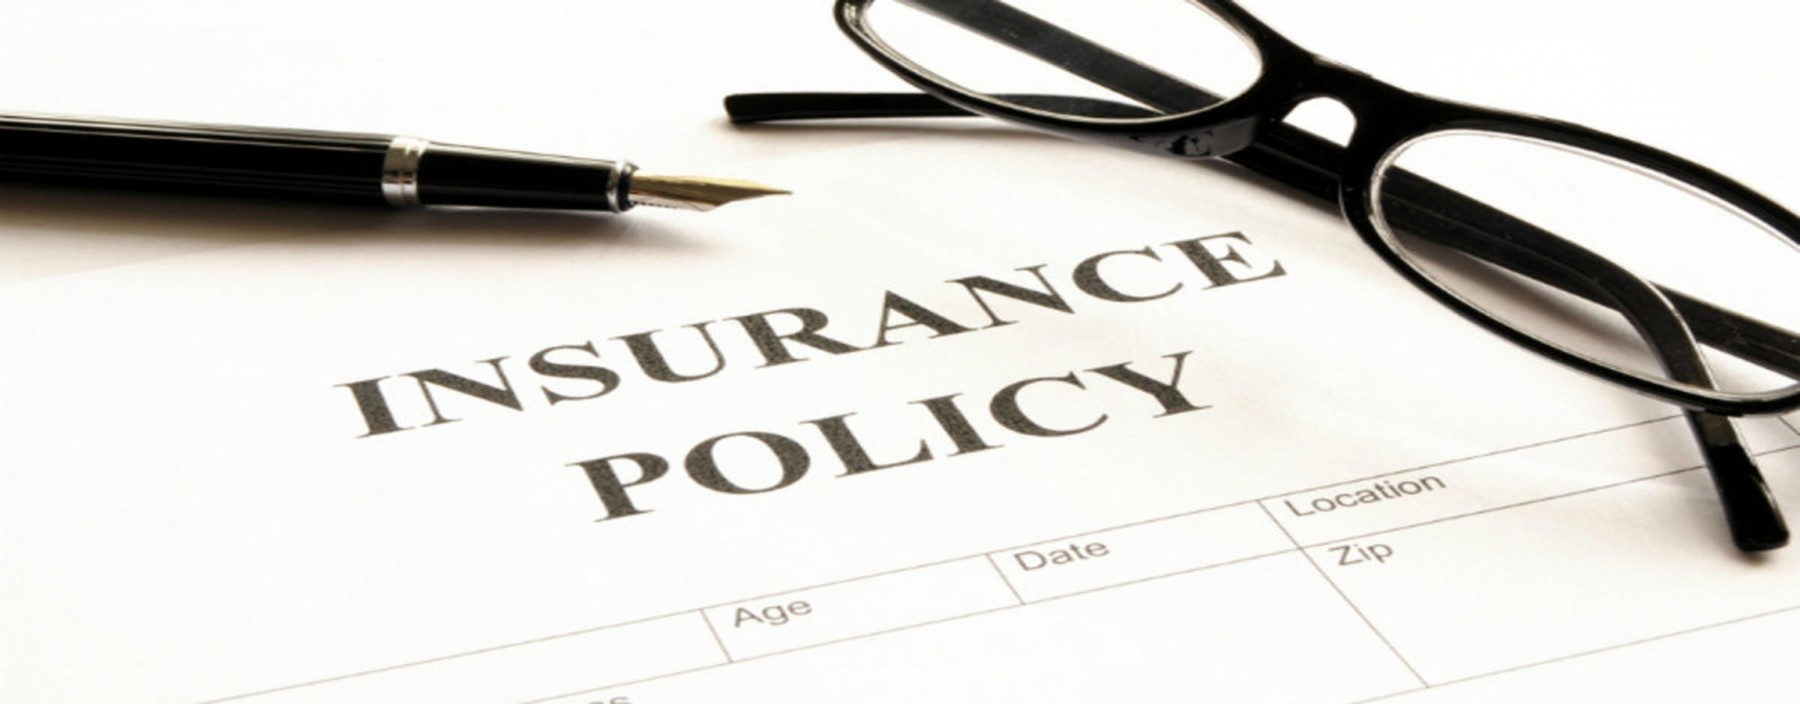 generic-insurance-policy-generic-shutterstock_55614910-Gunnar-Pippel-e1436237489504